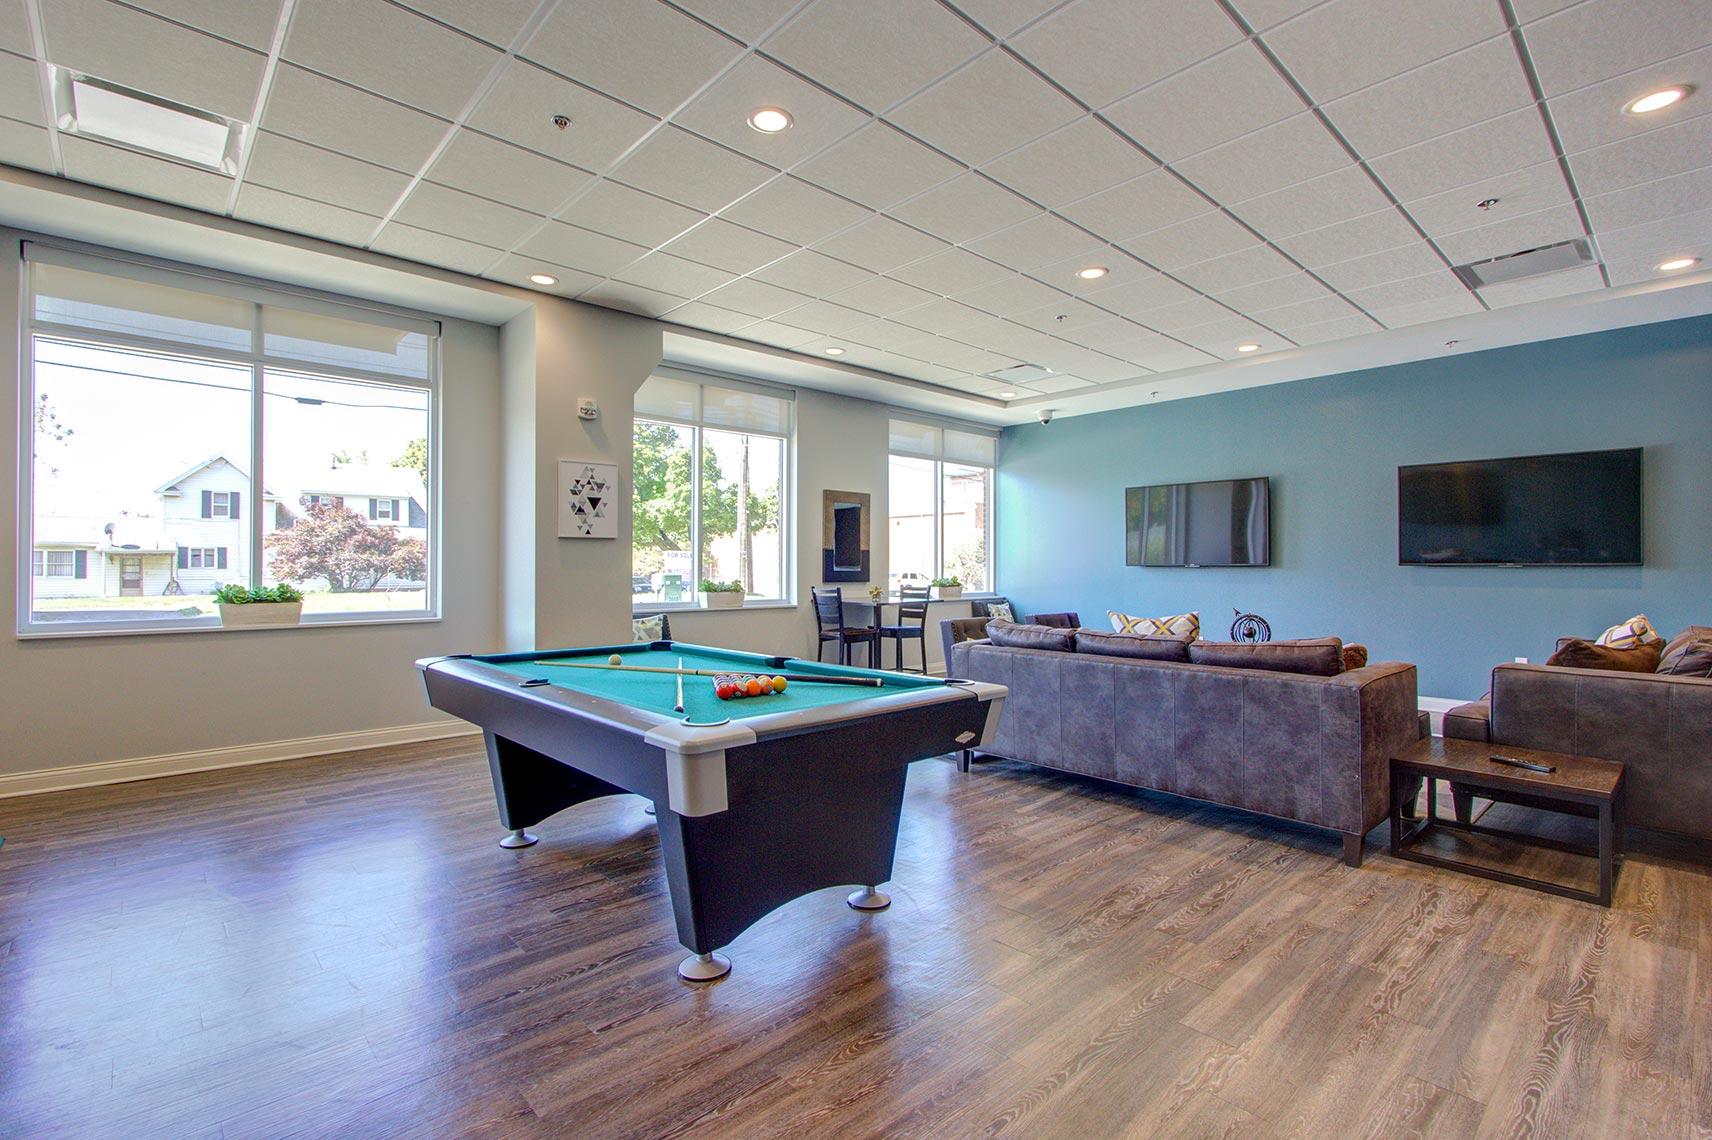 345-flats-recreation-room-2.jpg